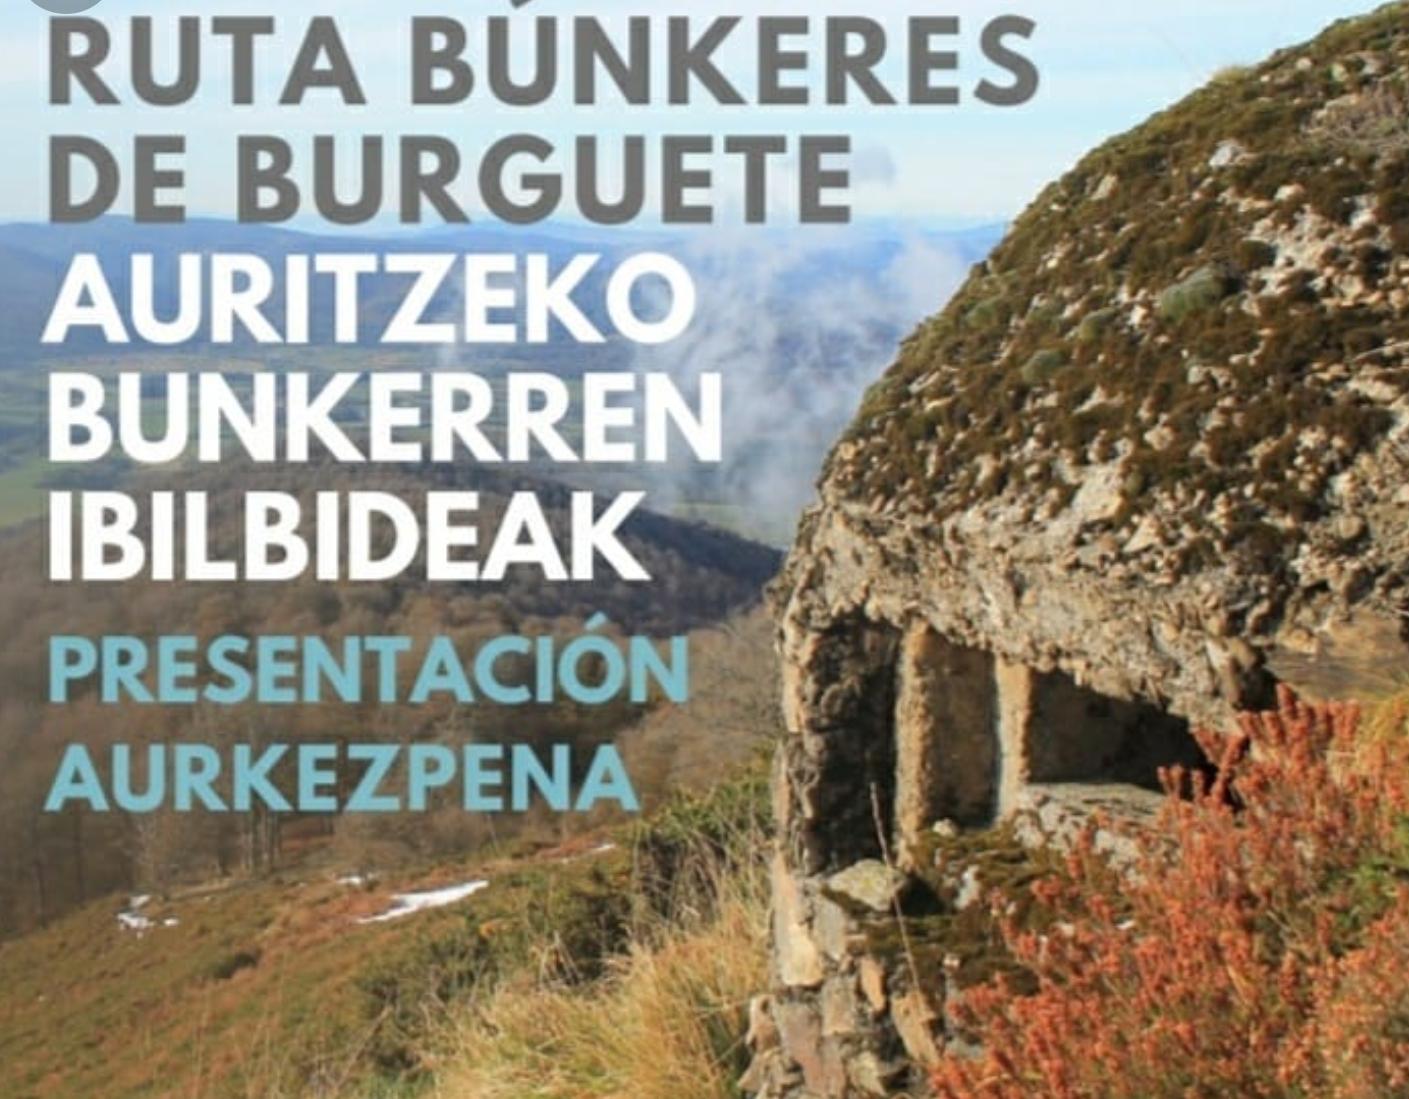 Navarra: Paseos guiados por los búnkeres de Auritz + Degustación (Gratis)